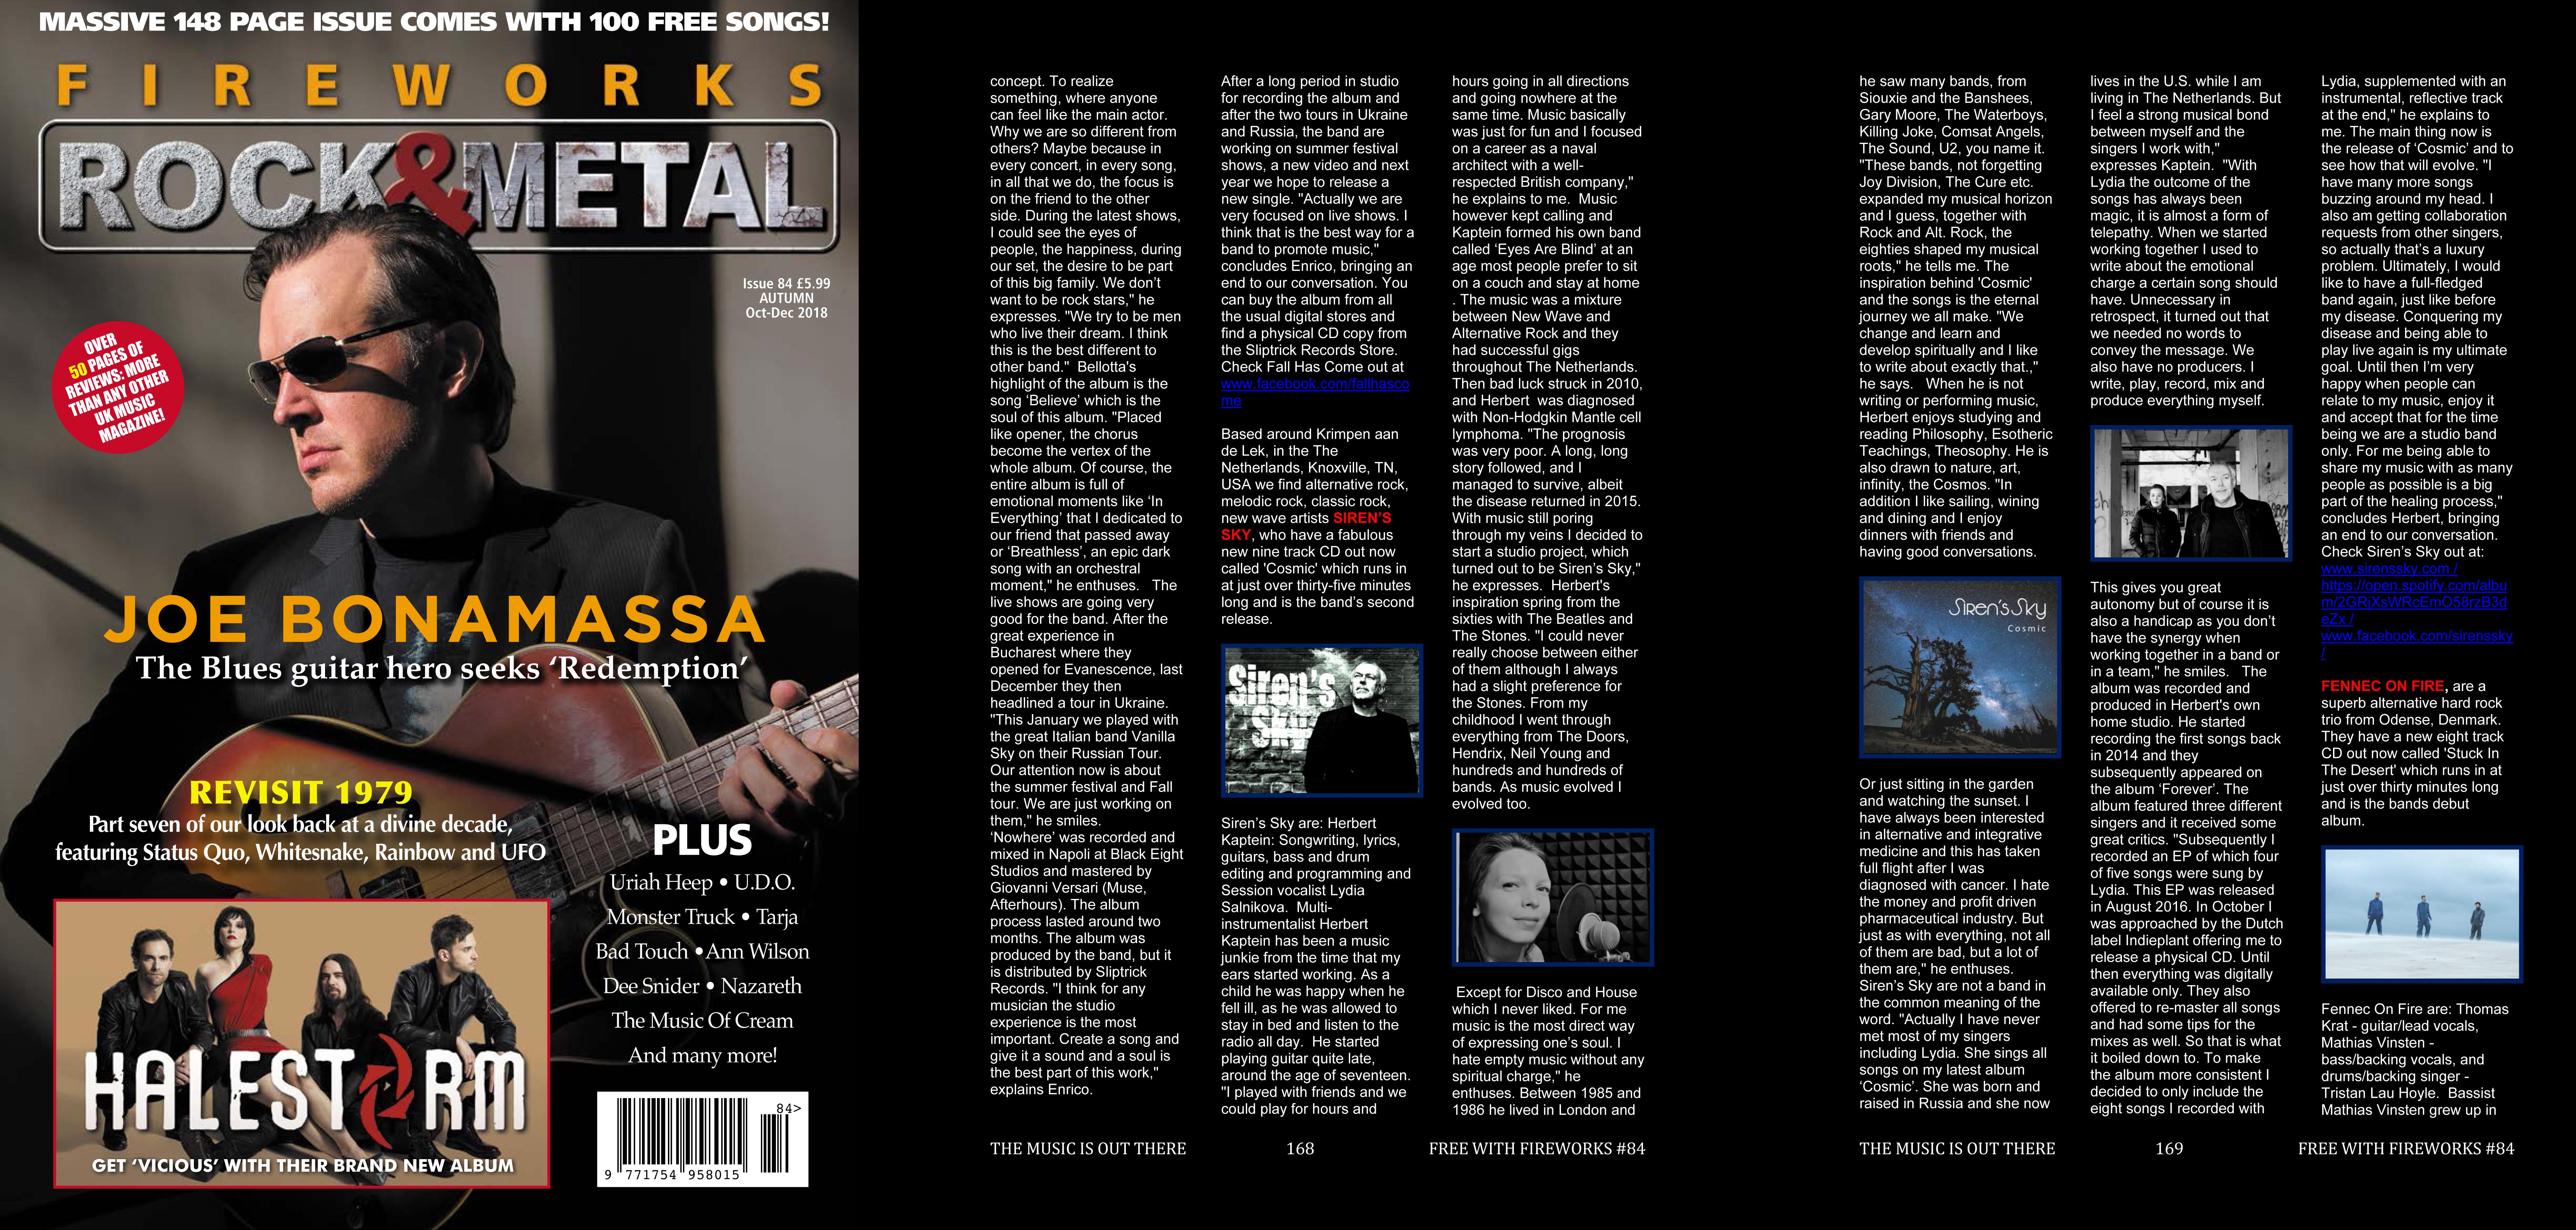 Siren's Sky Interview in UK Melodic Rock/Metal Fireworks